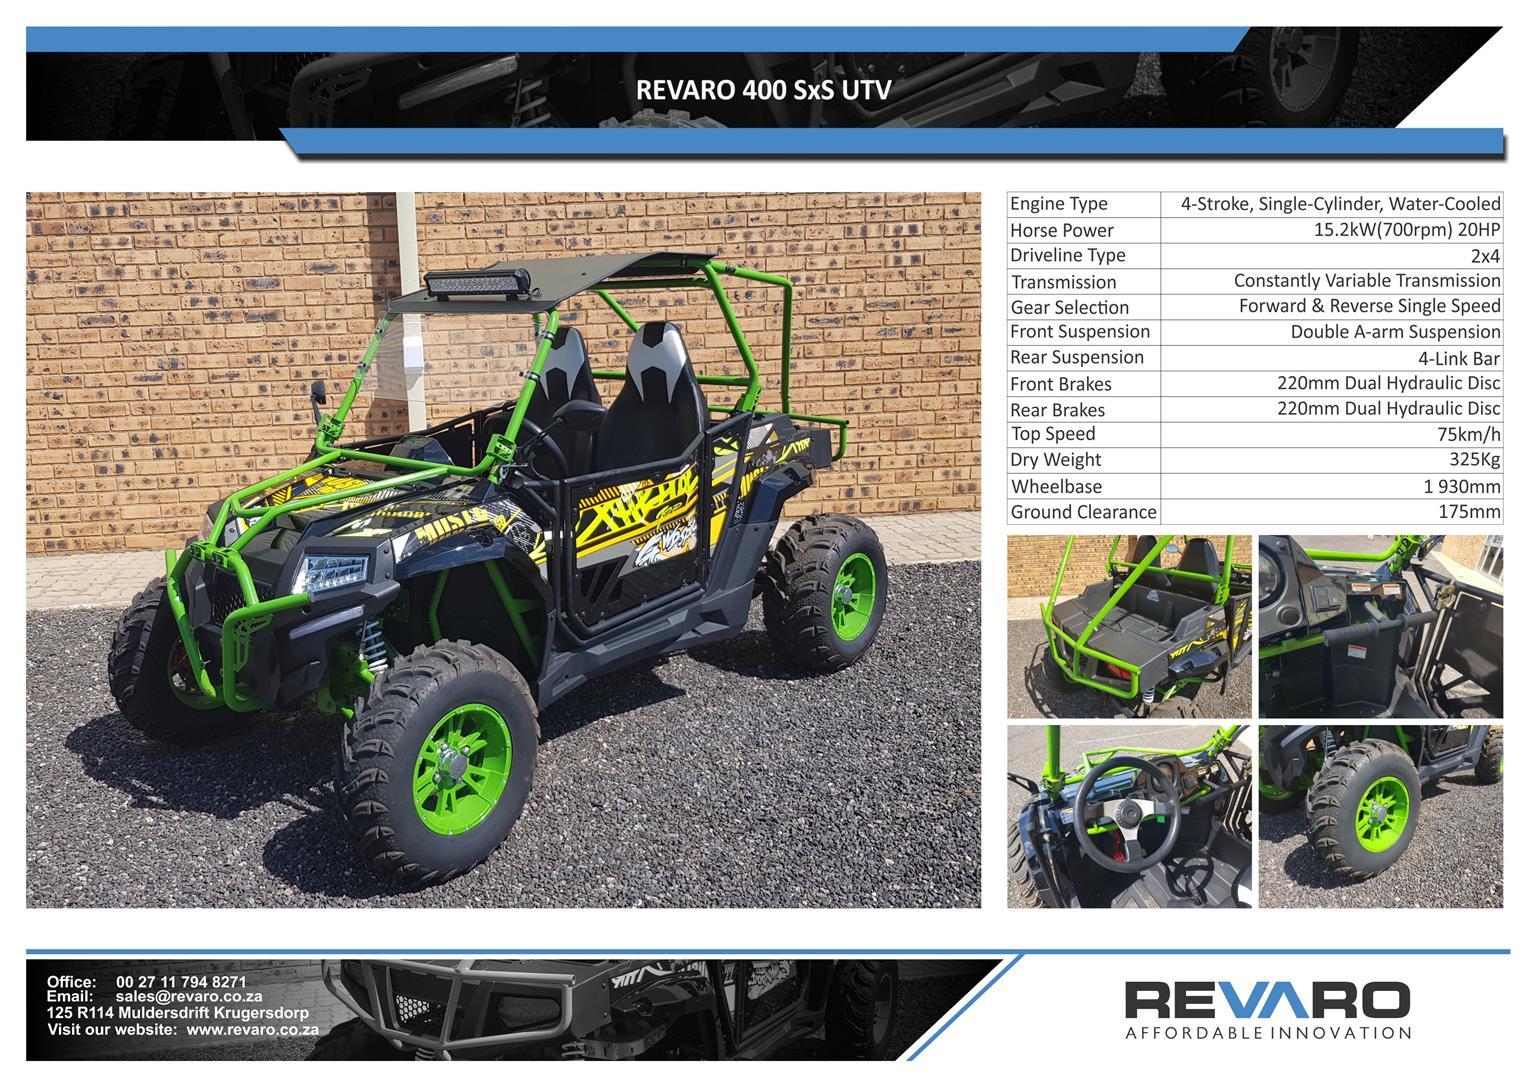 Revaro 400 side by side quad